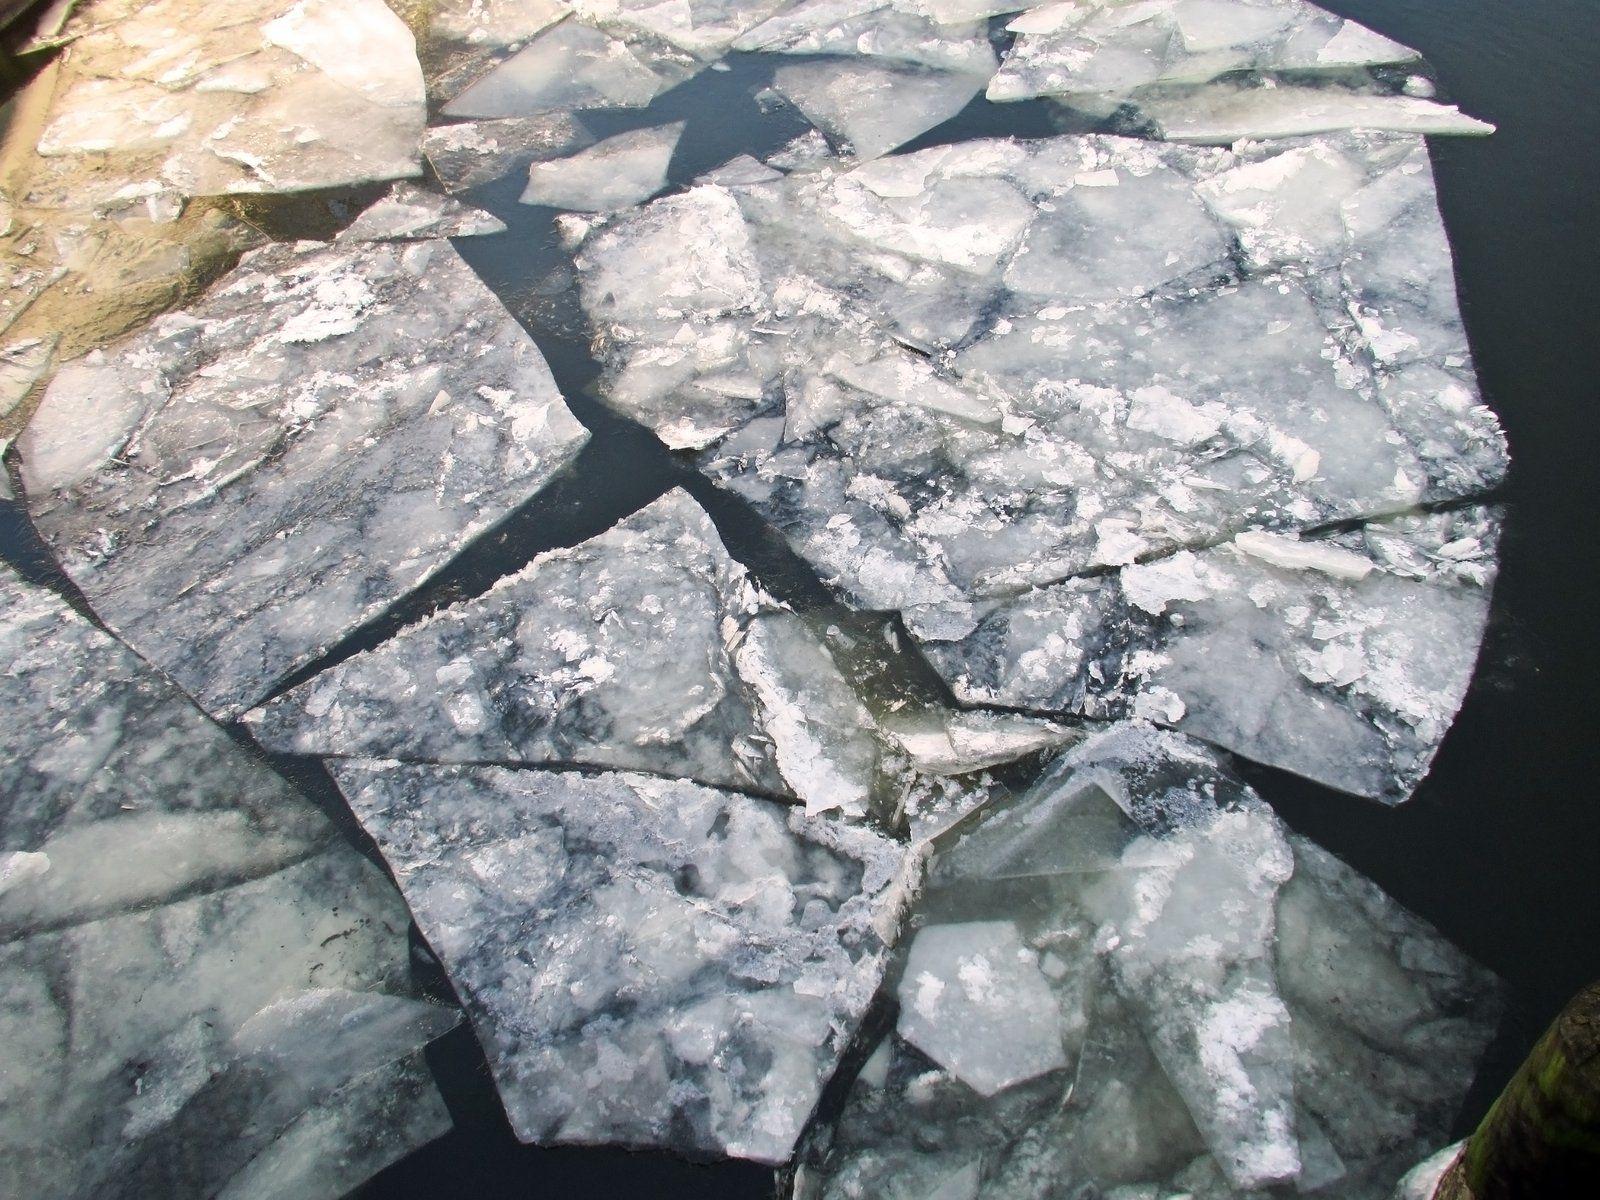 sheet-of-ice-2-1144765.jpg